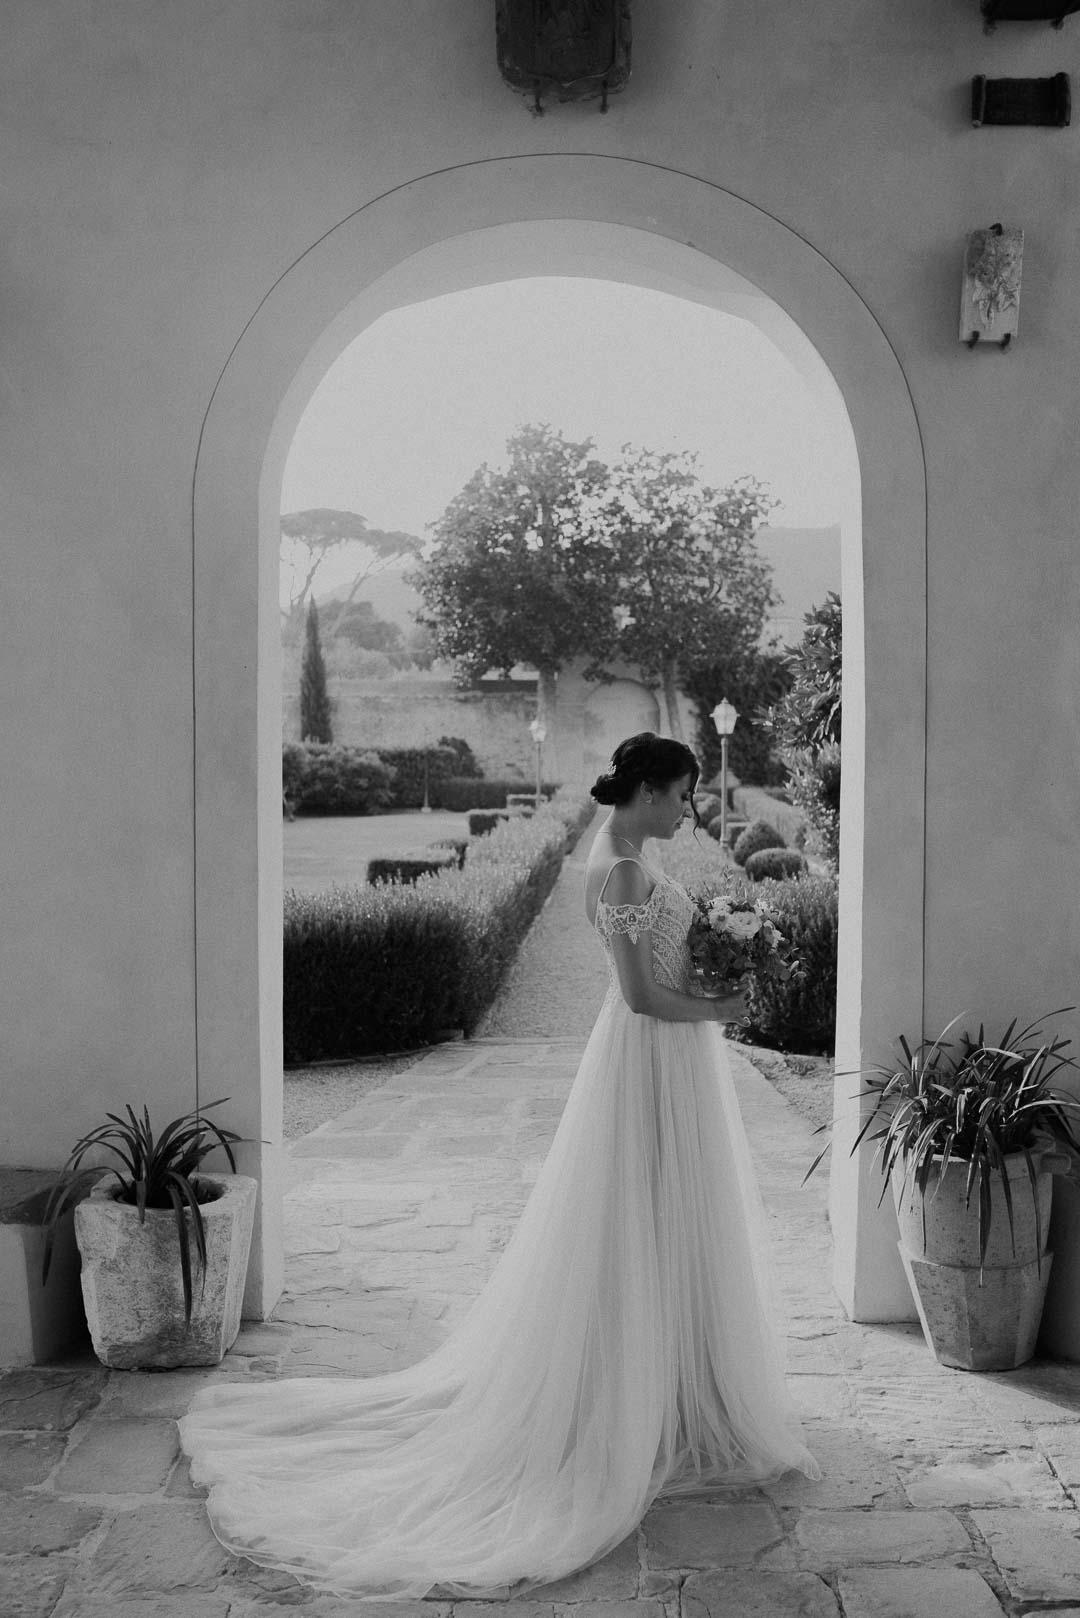 wedding-photographer-destination-fineart-bespoke-reportage-tuscany-villascorzi-vivianeizzo-spazio46-100